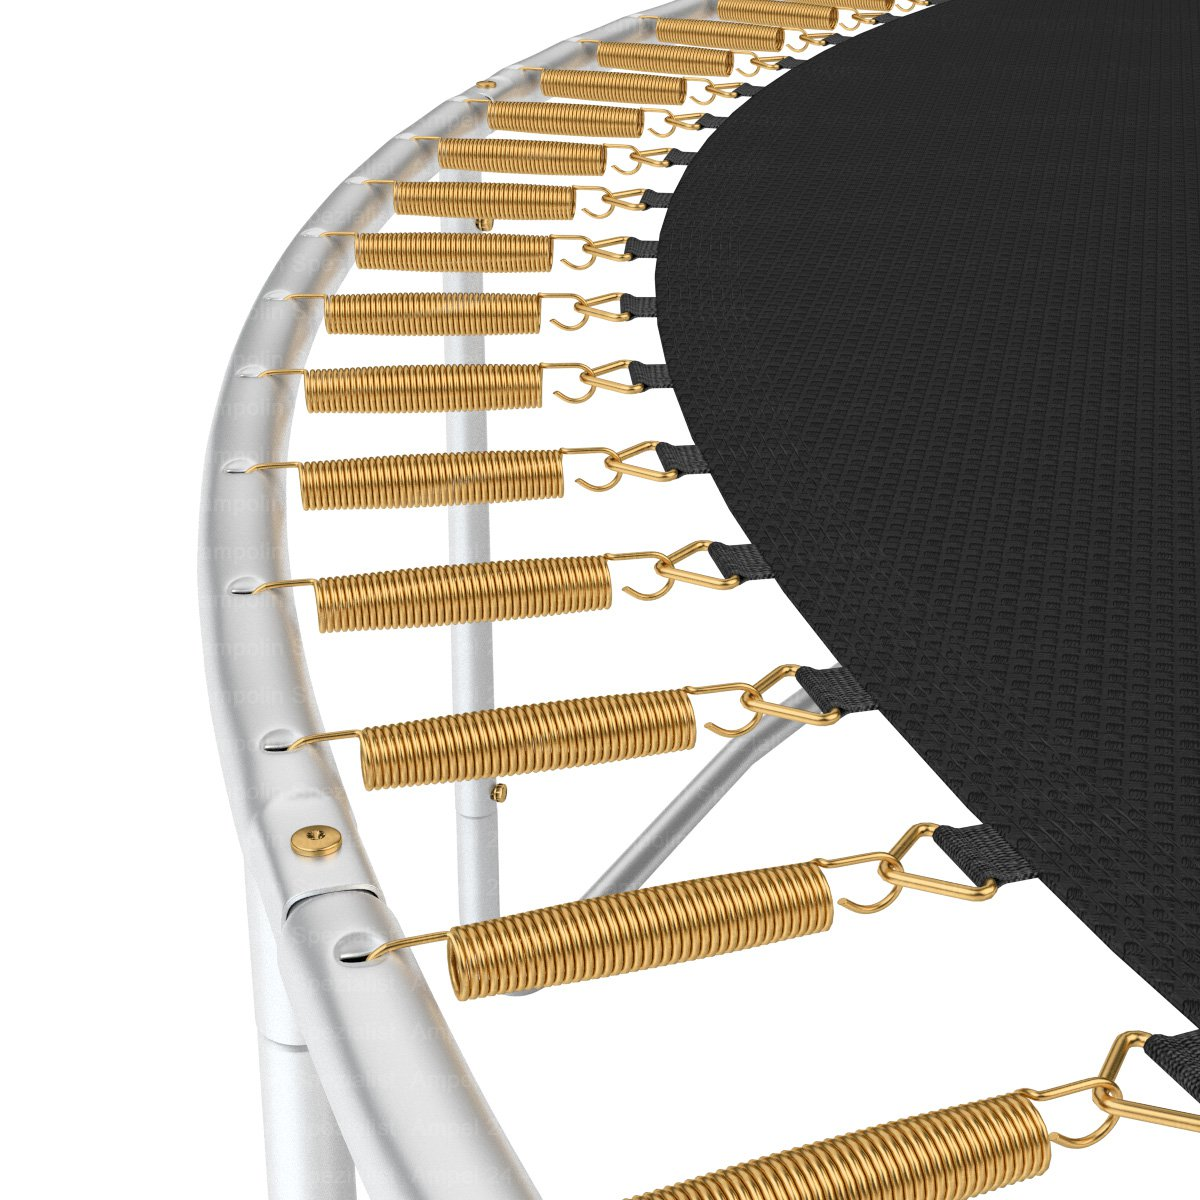 original ampel 24 trampolin 430 cm mit netz neuste version 2013 ebay. Black Bedroom Furniture Sets. Home Design Ideas